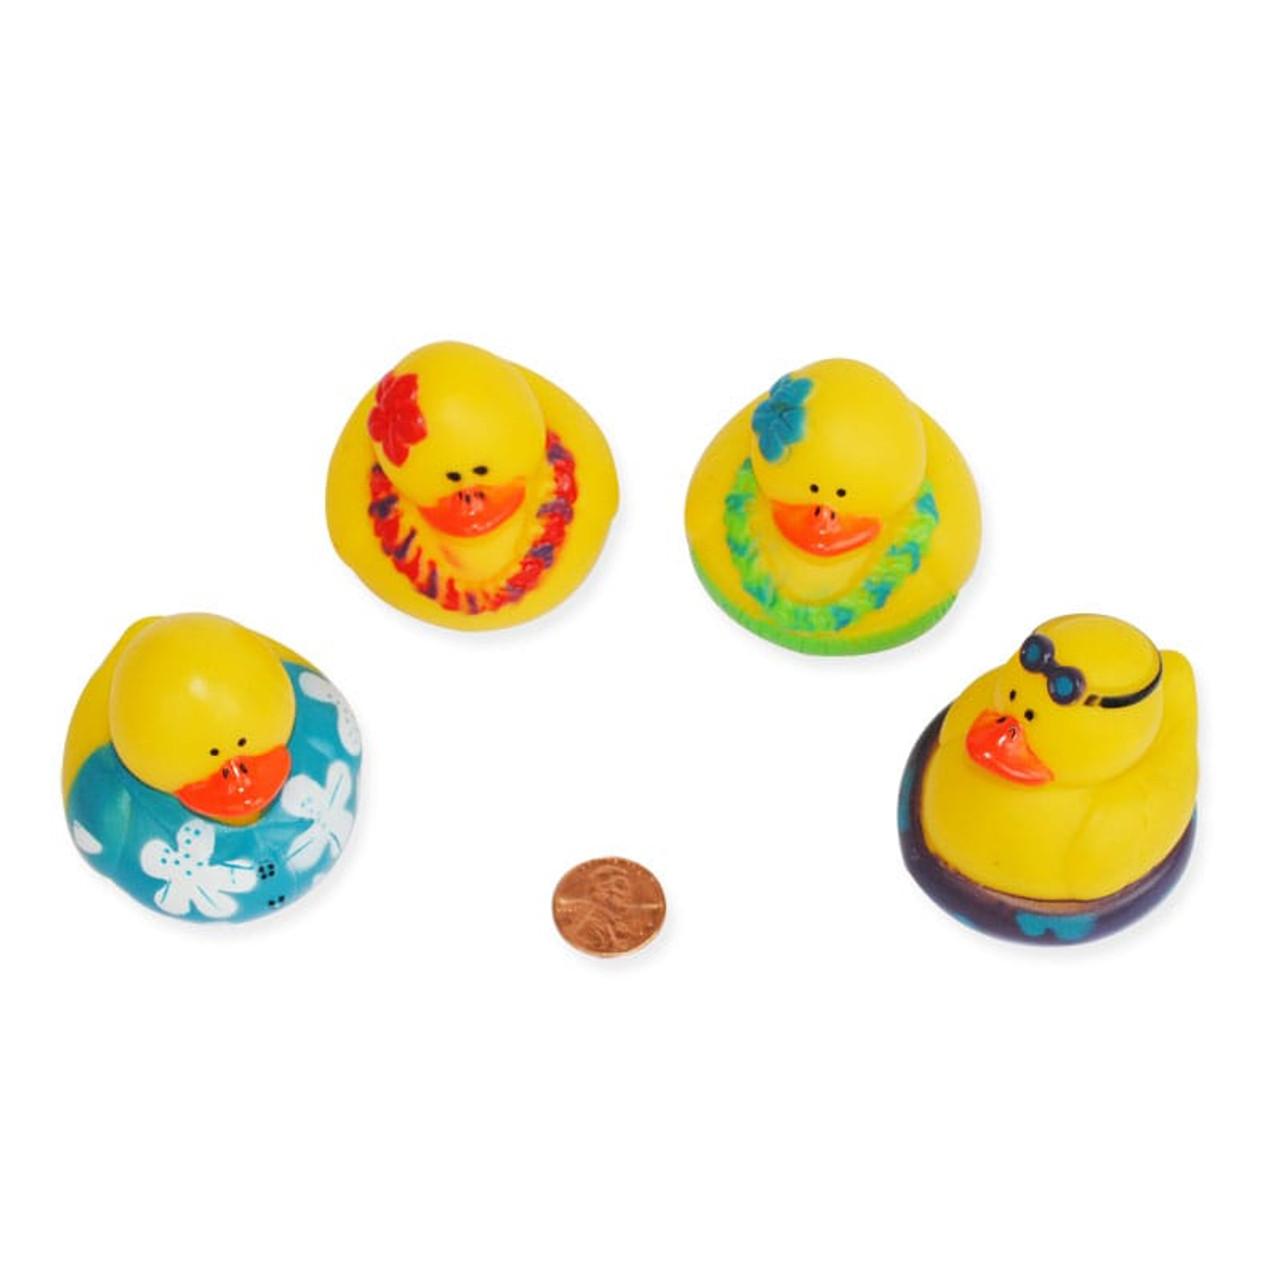 Luau Rubber Ducks - Small Luau Prize